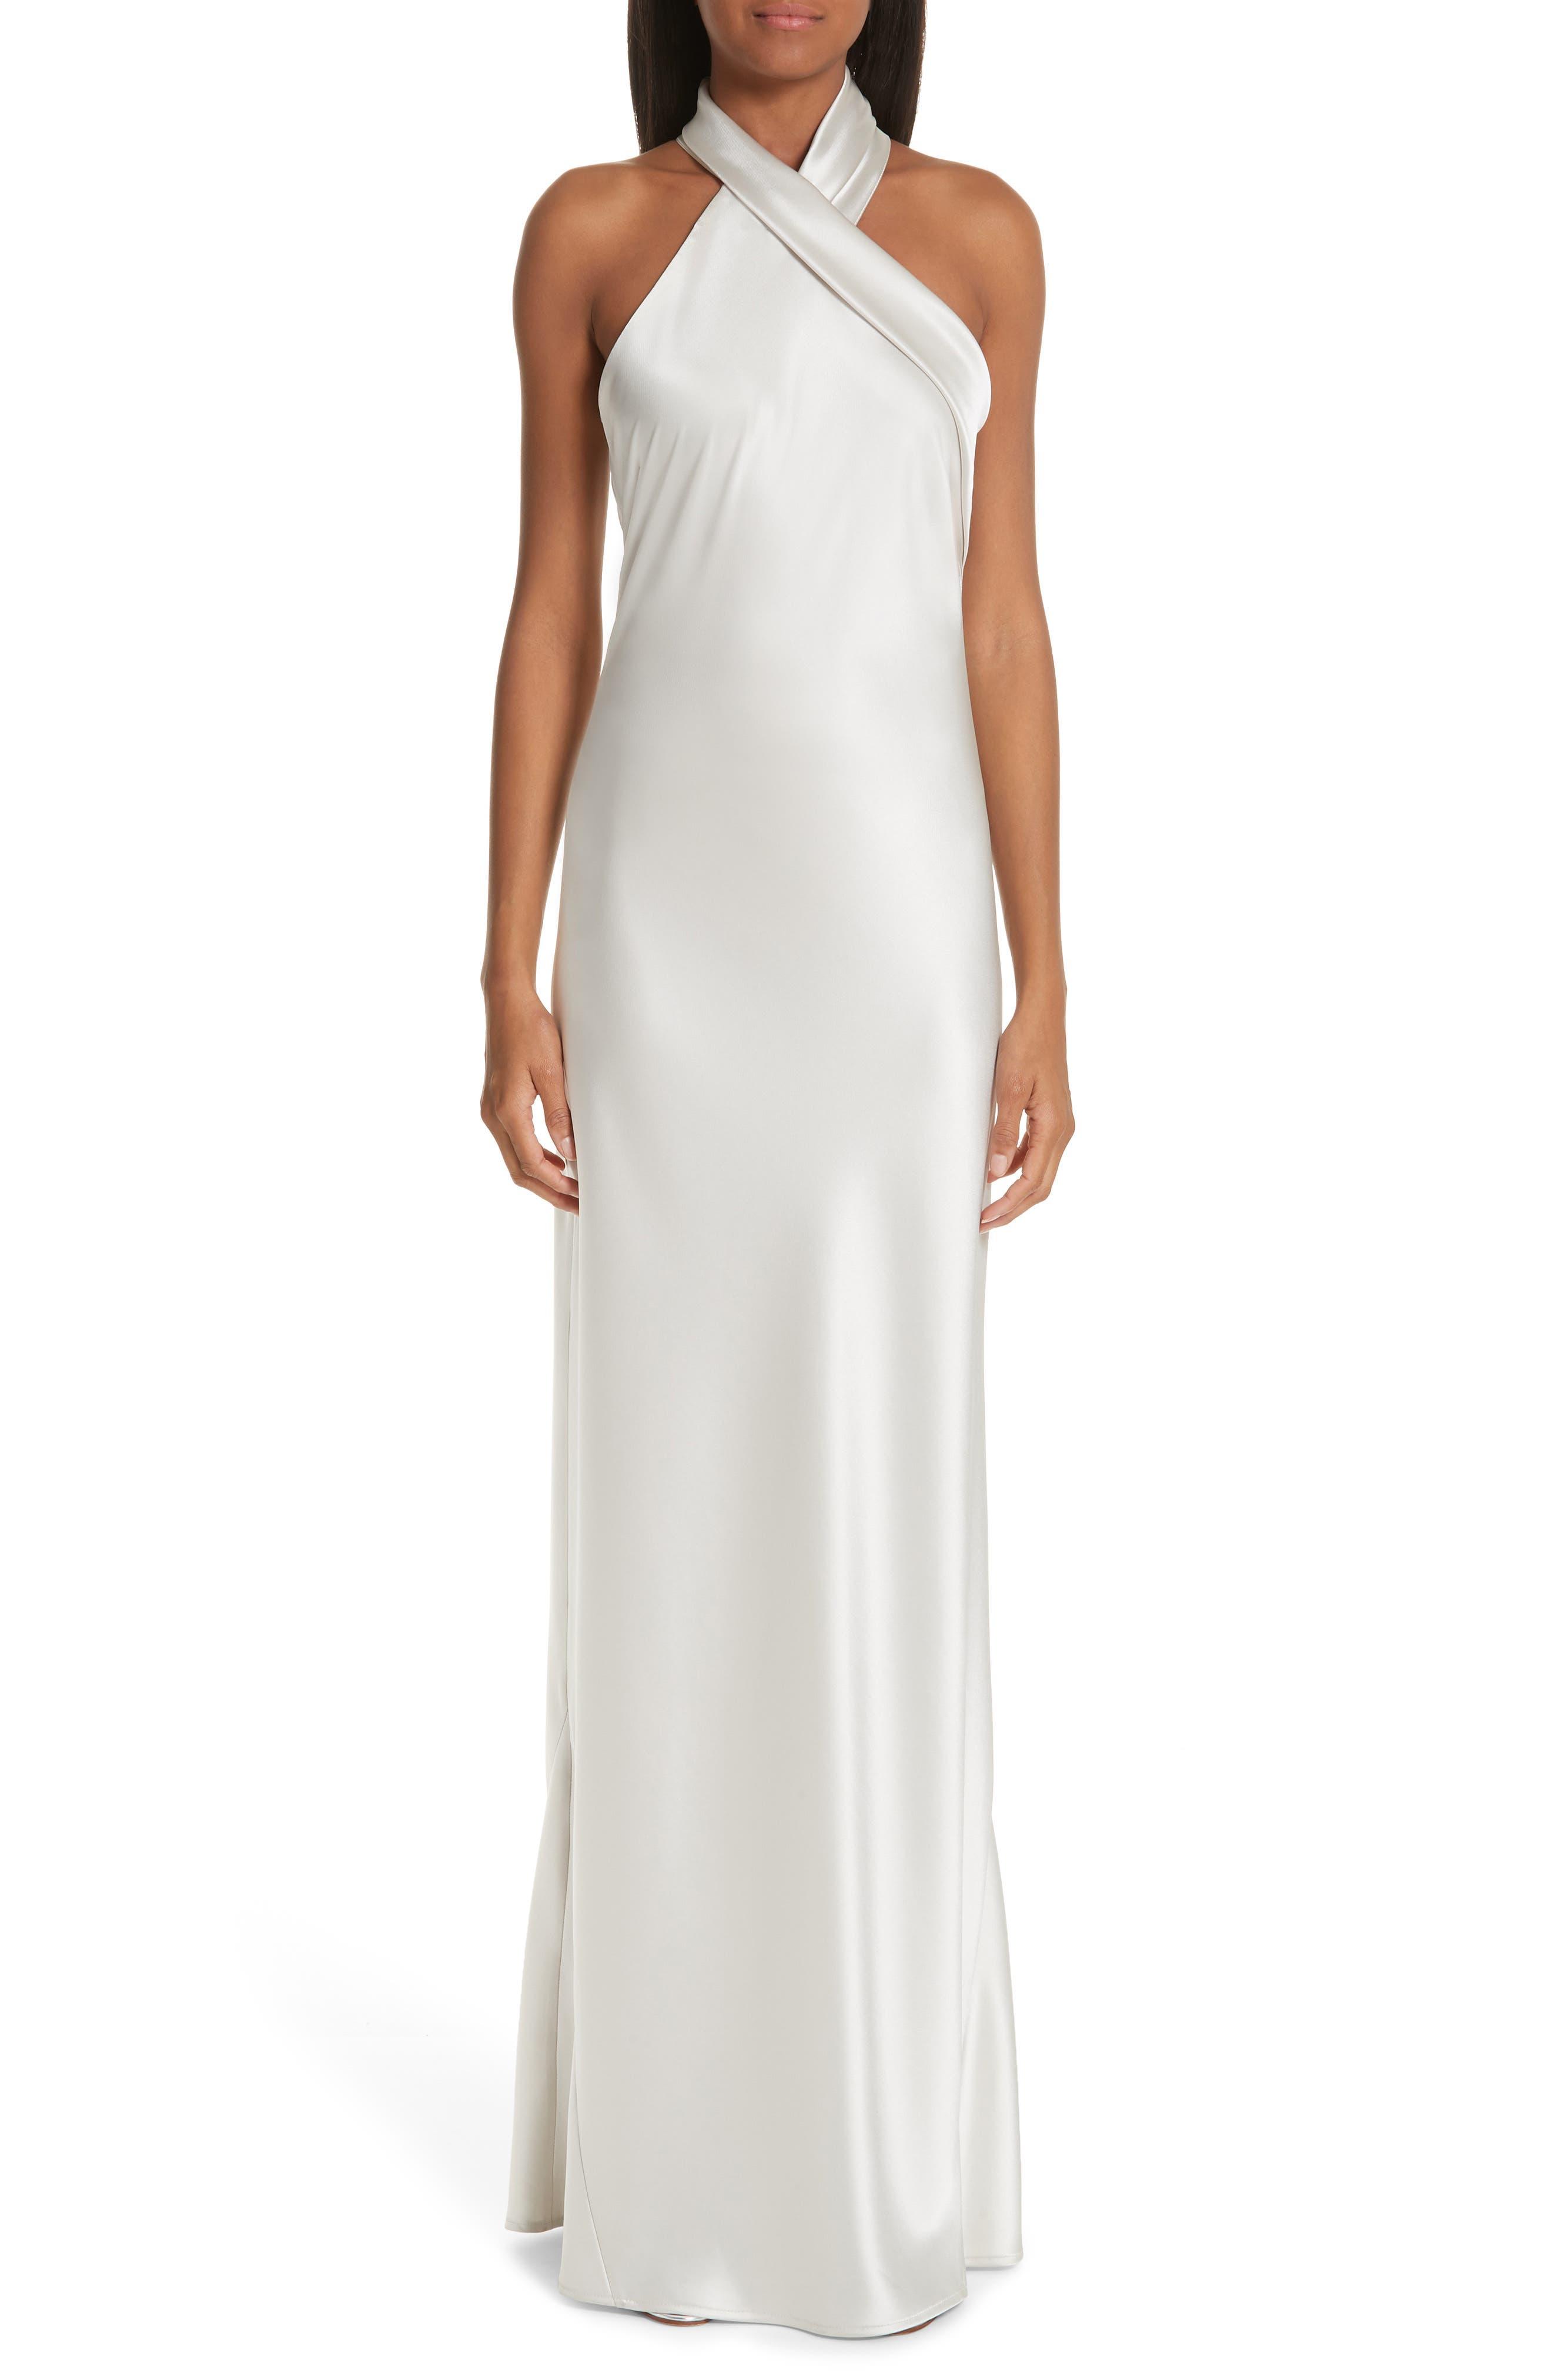 Galvan Twist Halter Neck Satin Dress, 6 FR - Metallic